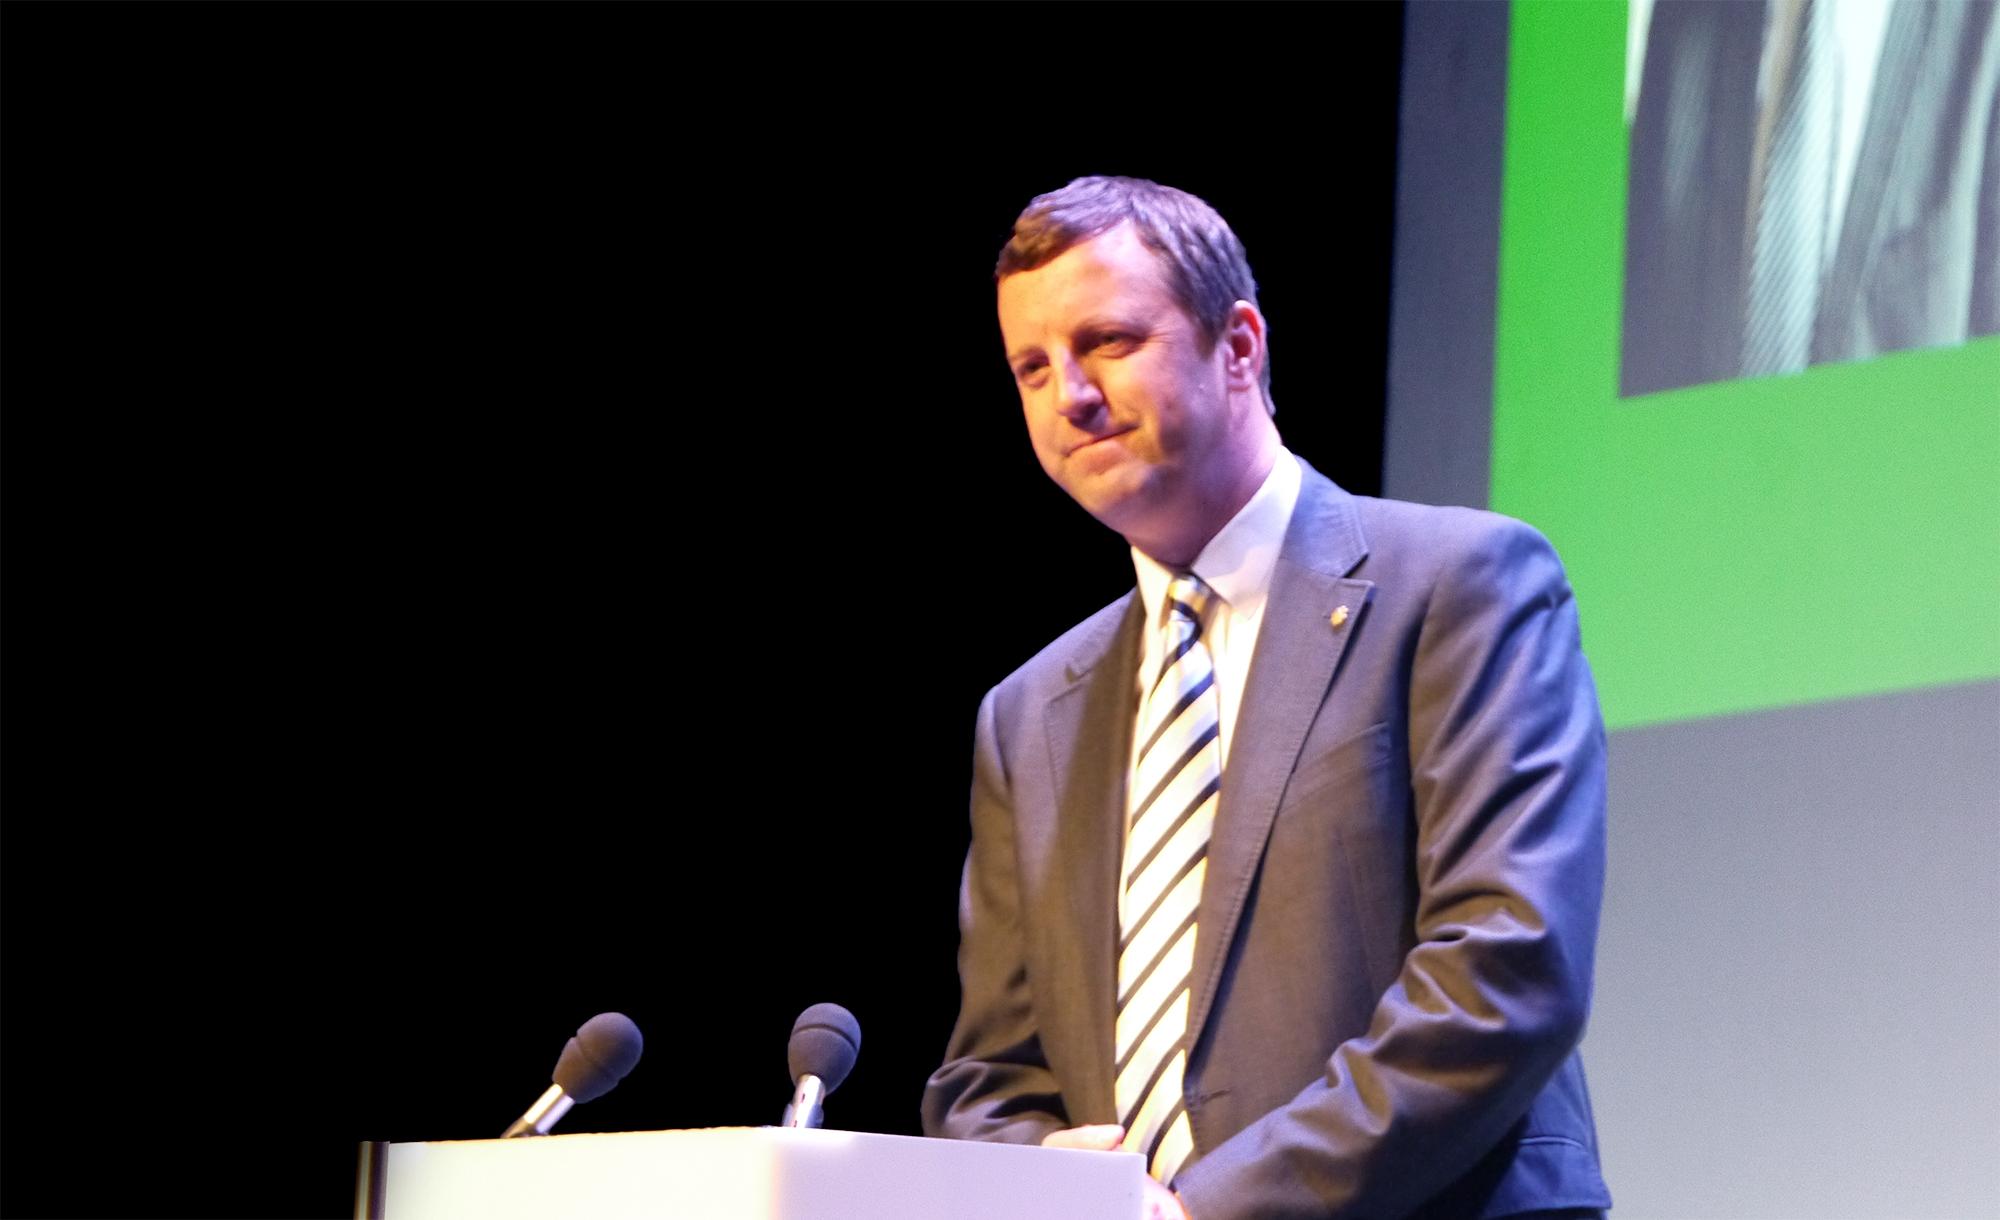 Newport_conference.jpg